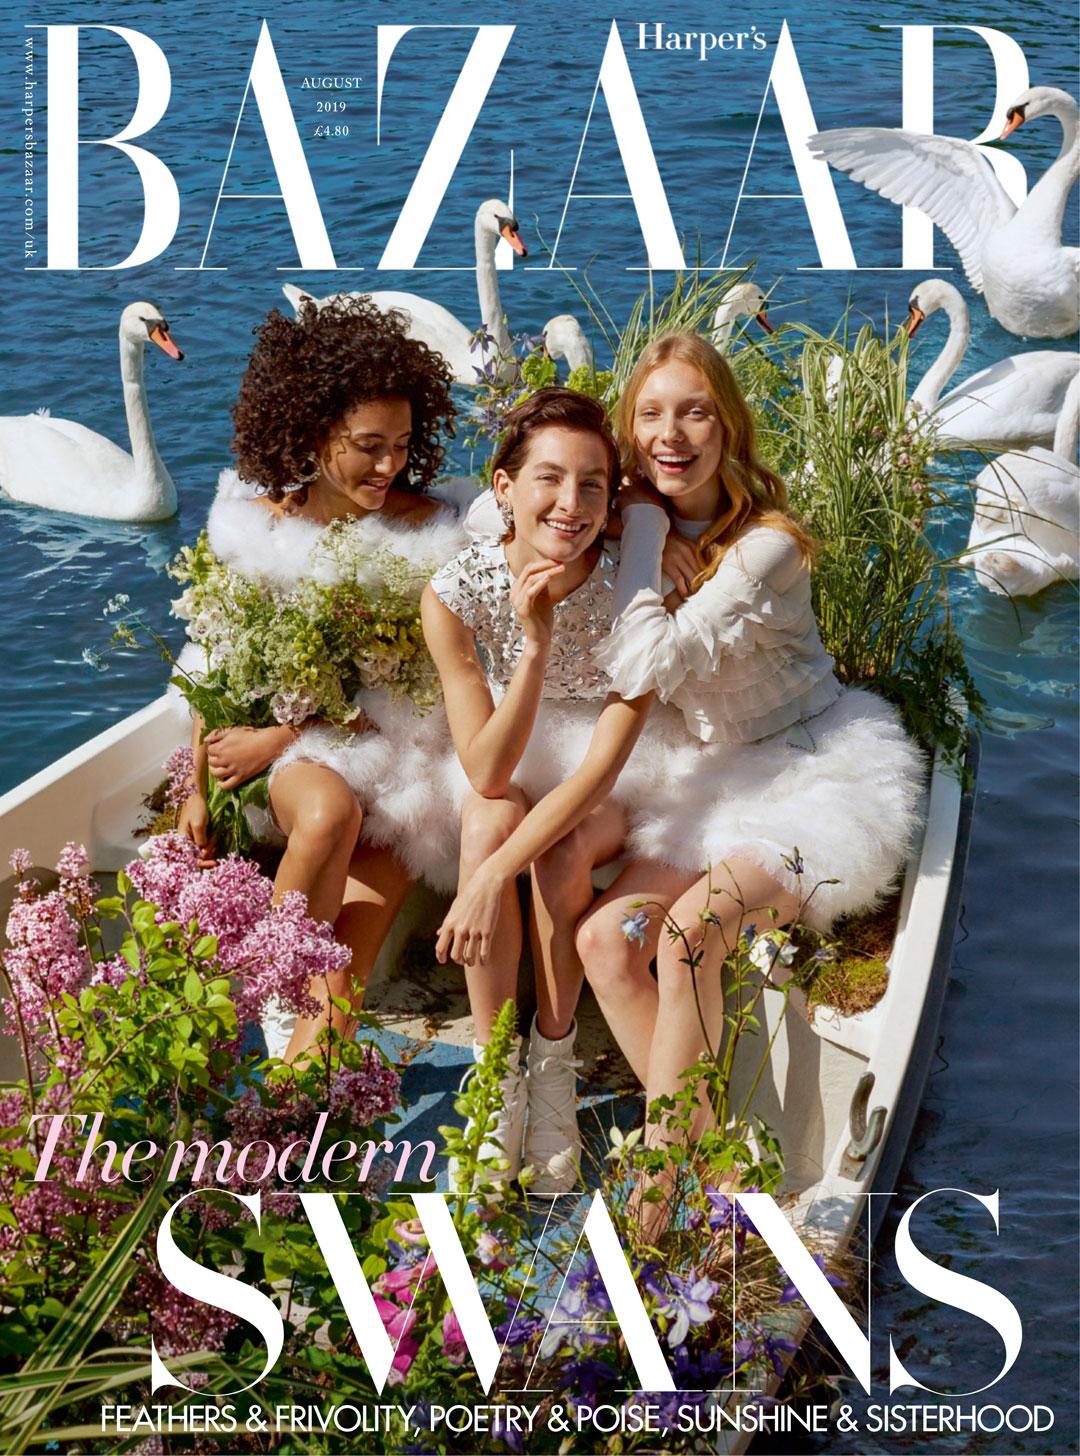 Harpers-Bazaar-Aug19-Cover.jpg